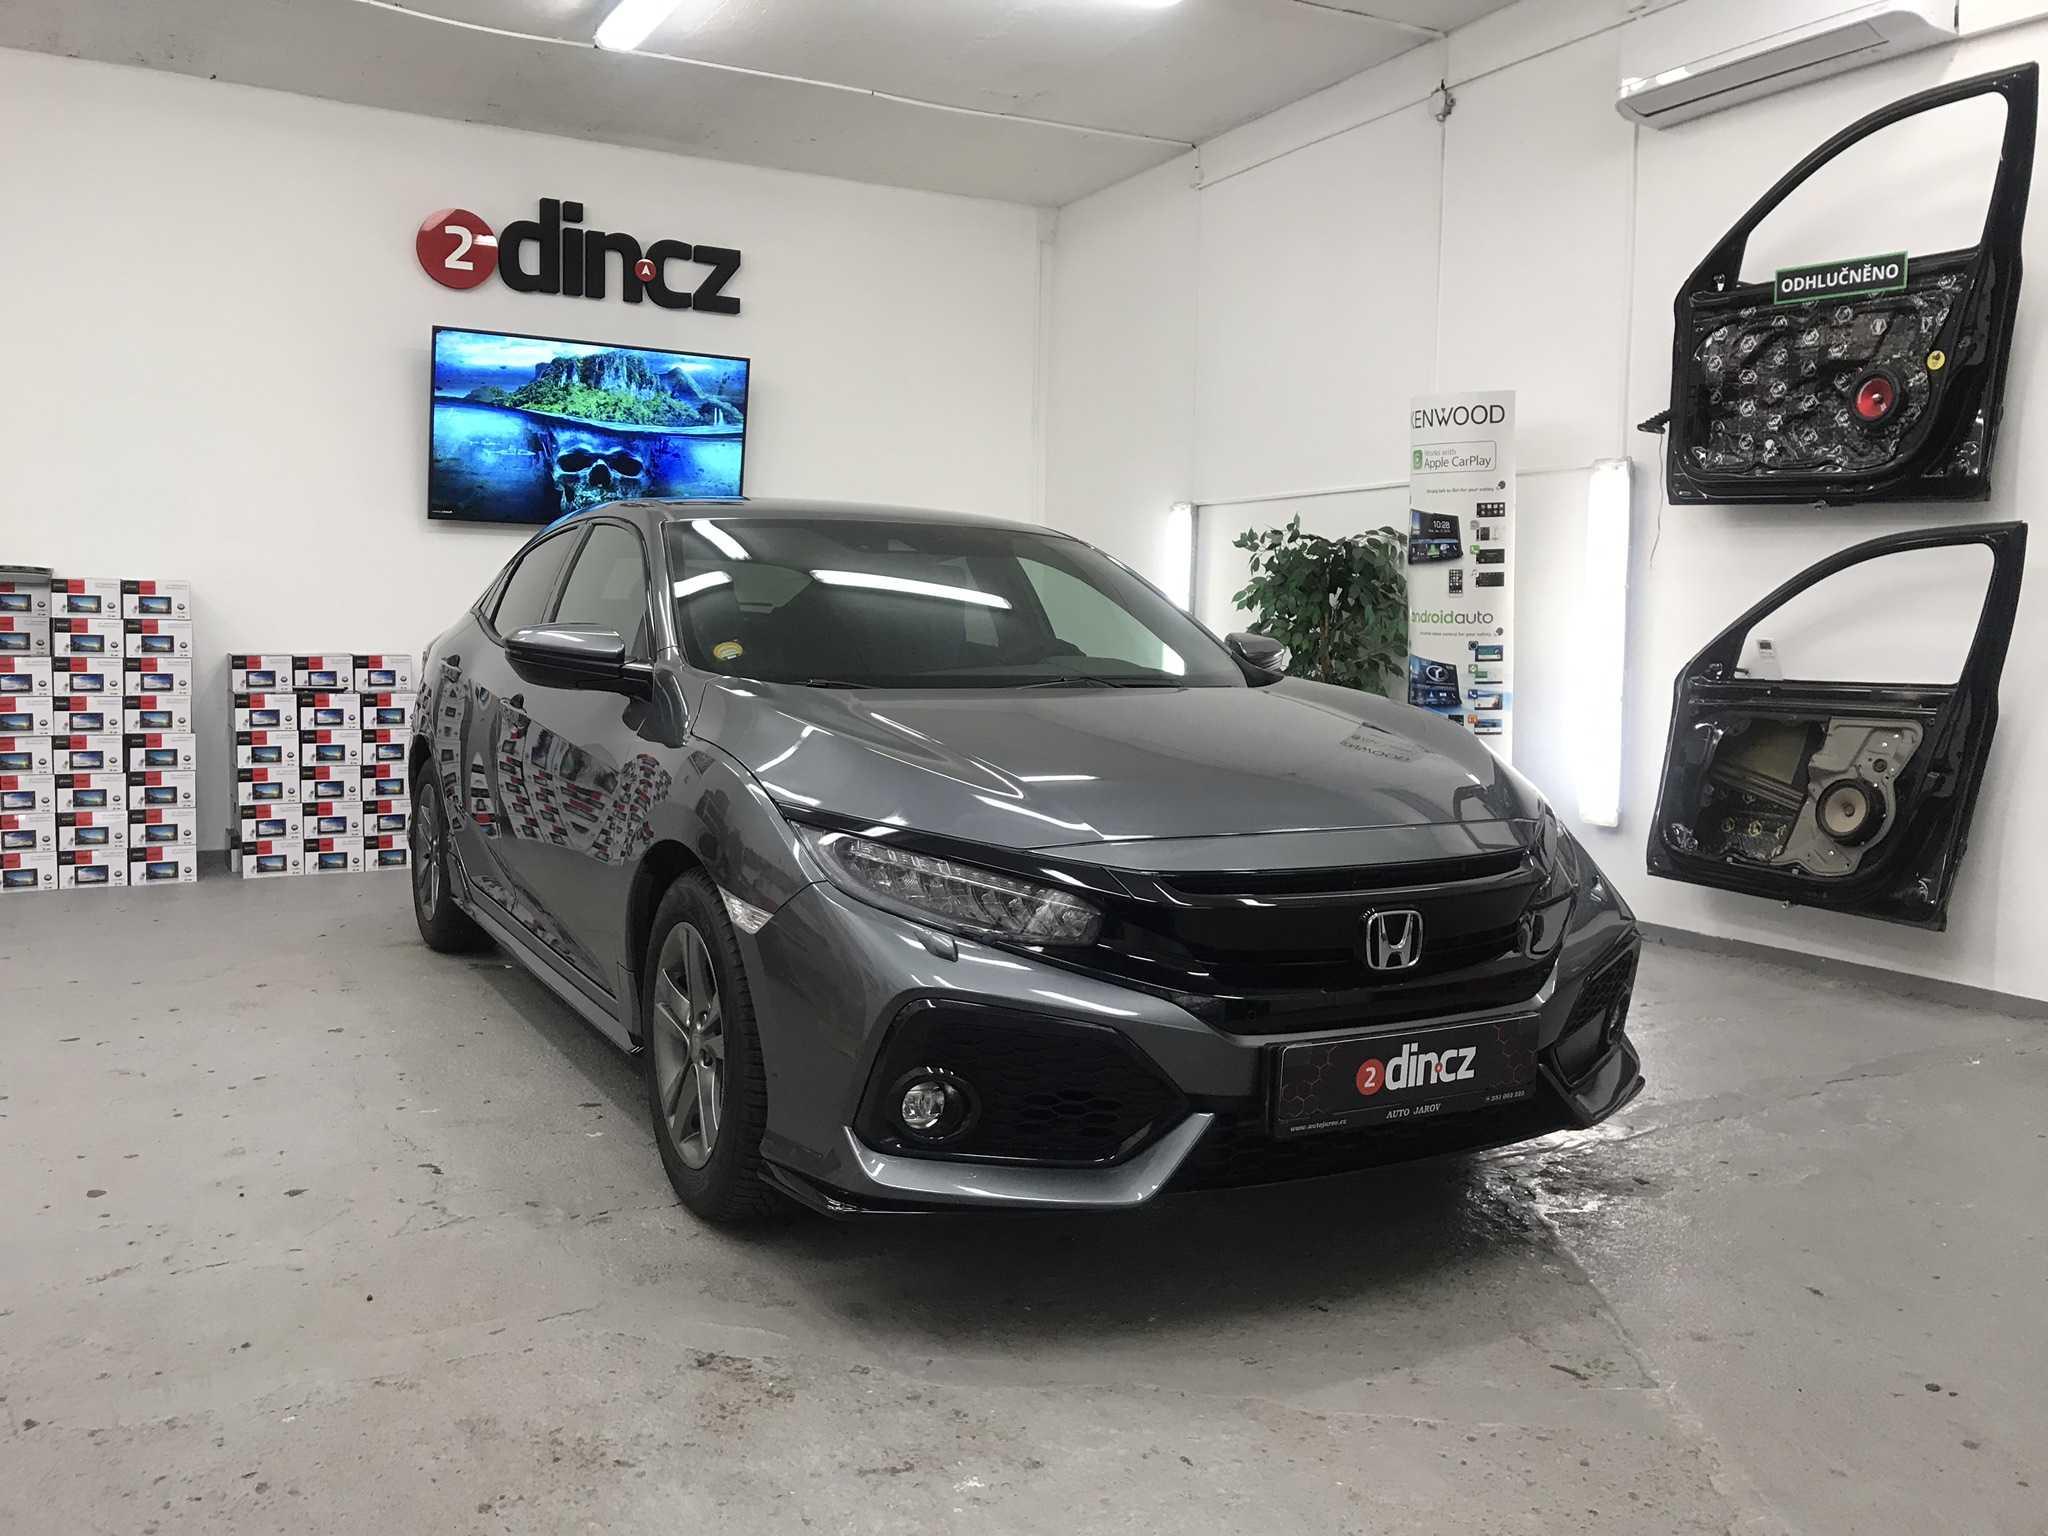 Honda Civic 10g - Odhlučnění Premium